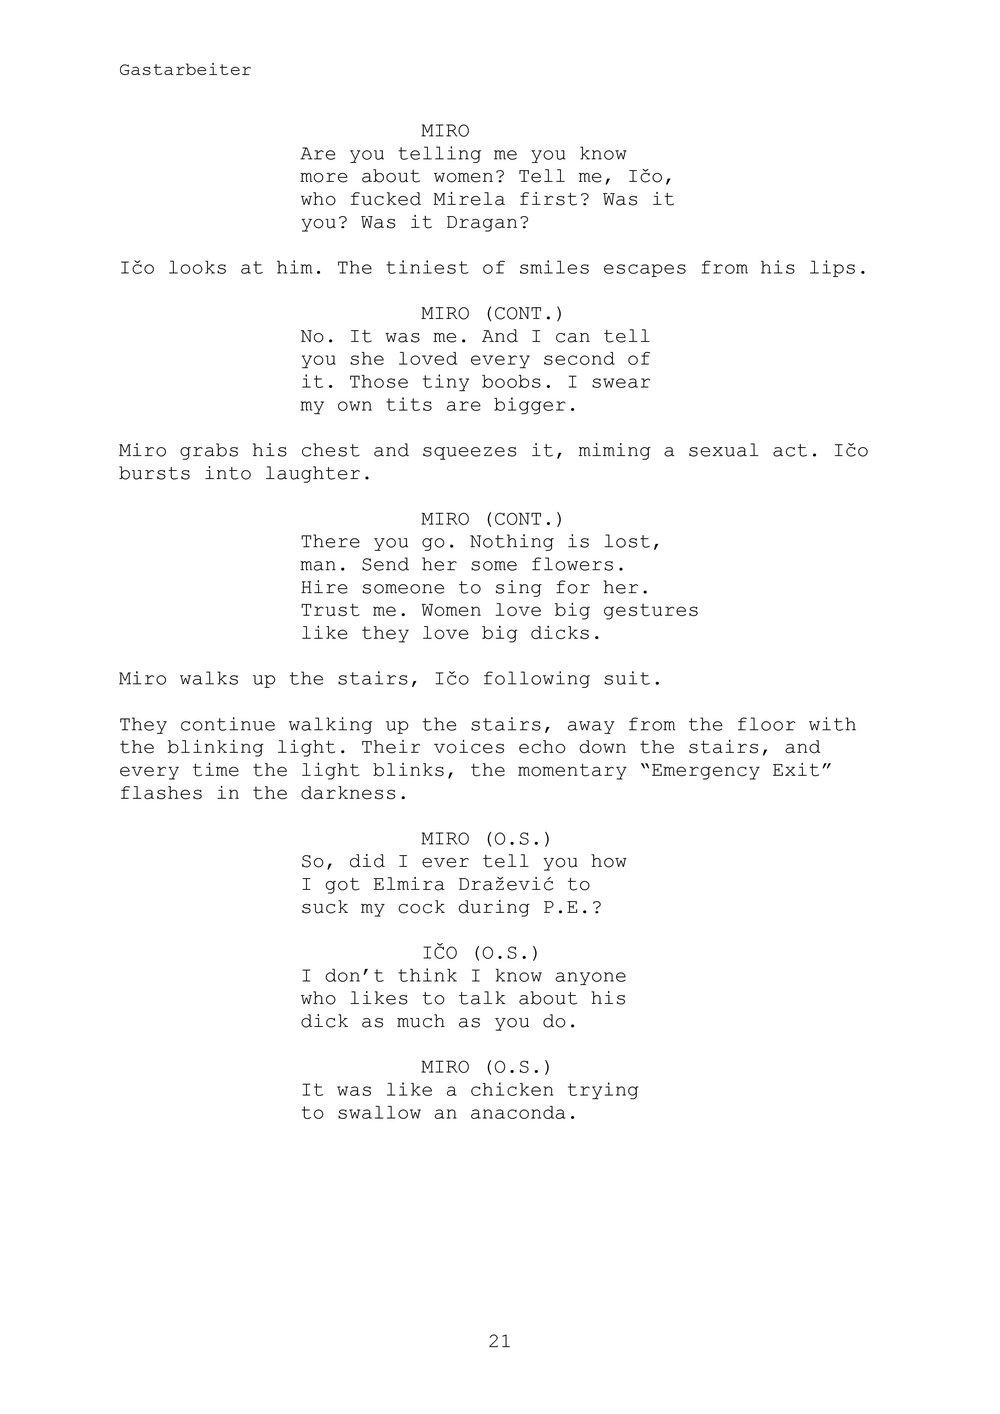 Gastarbeiter script-21.jpg